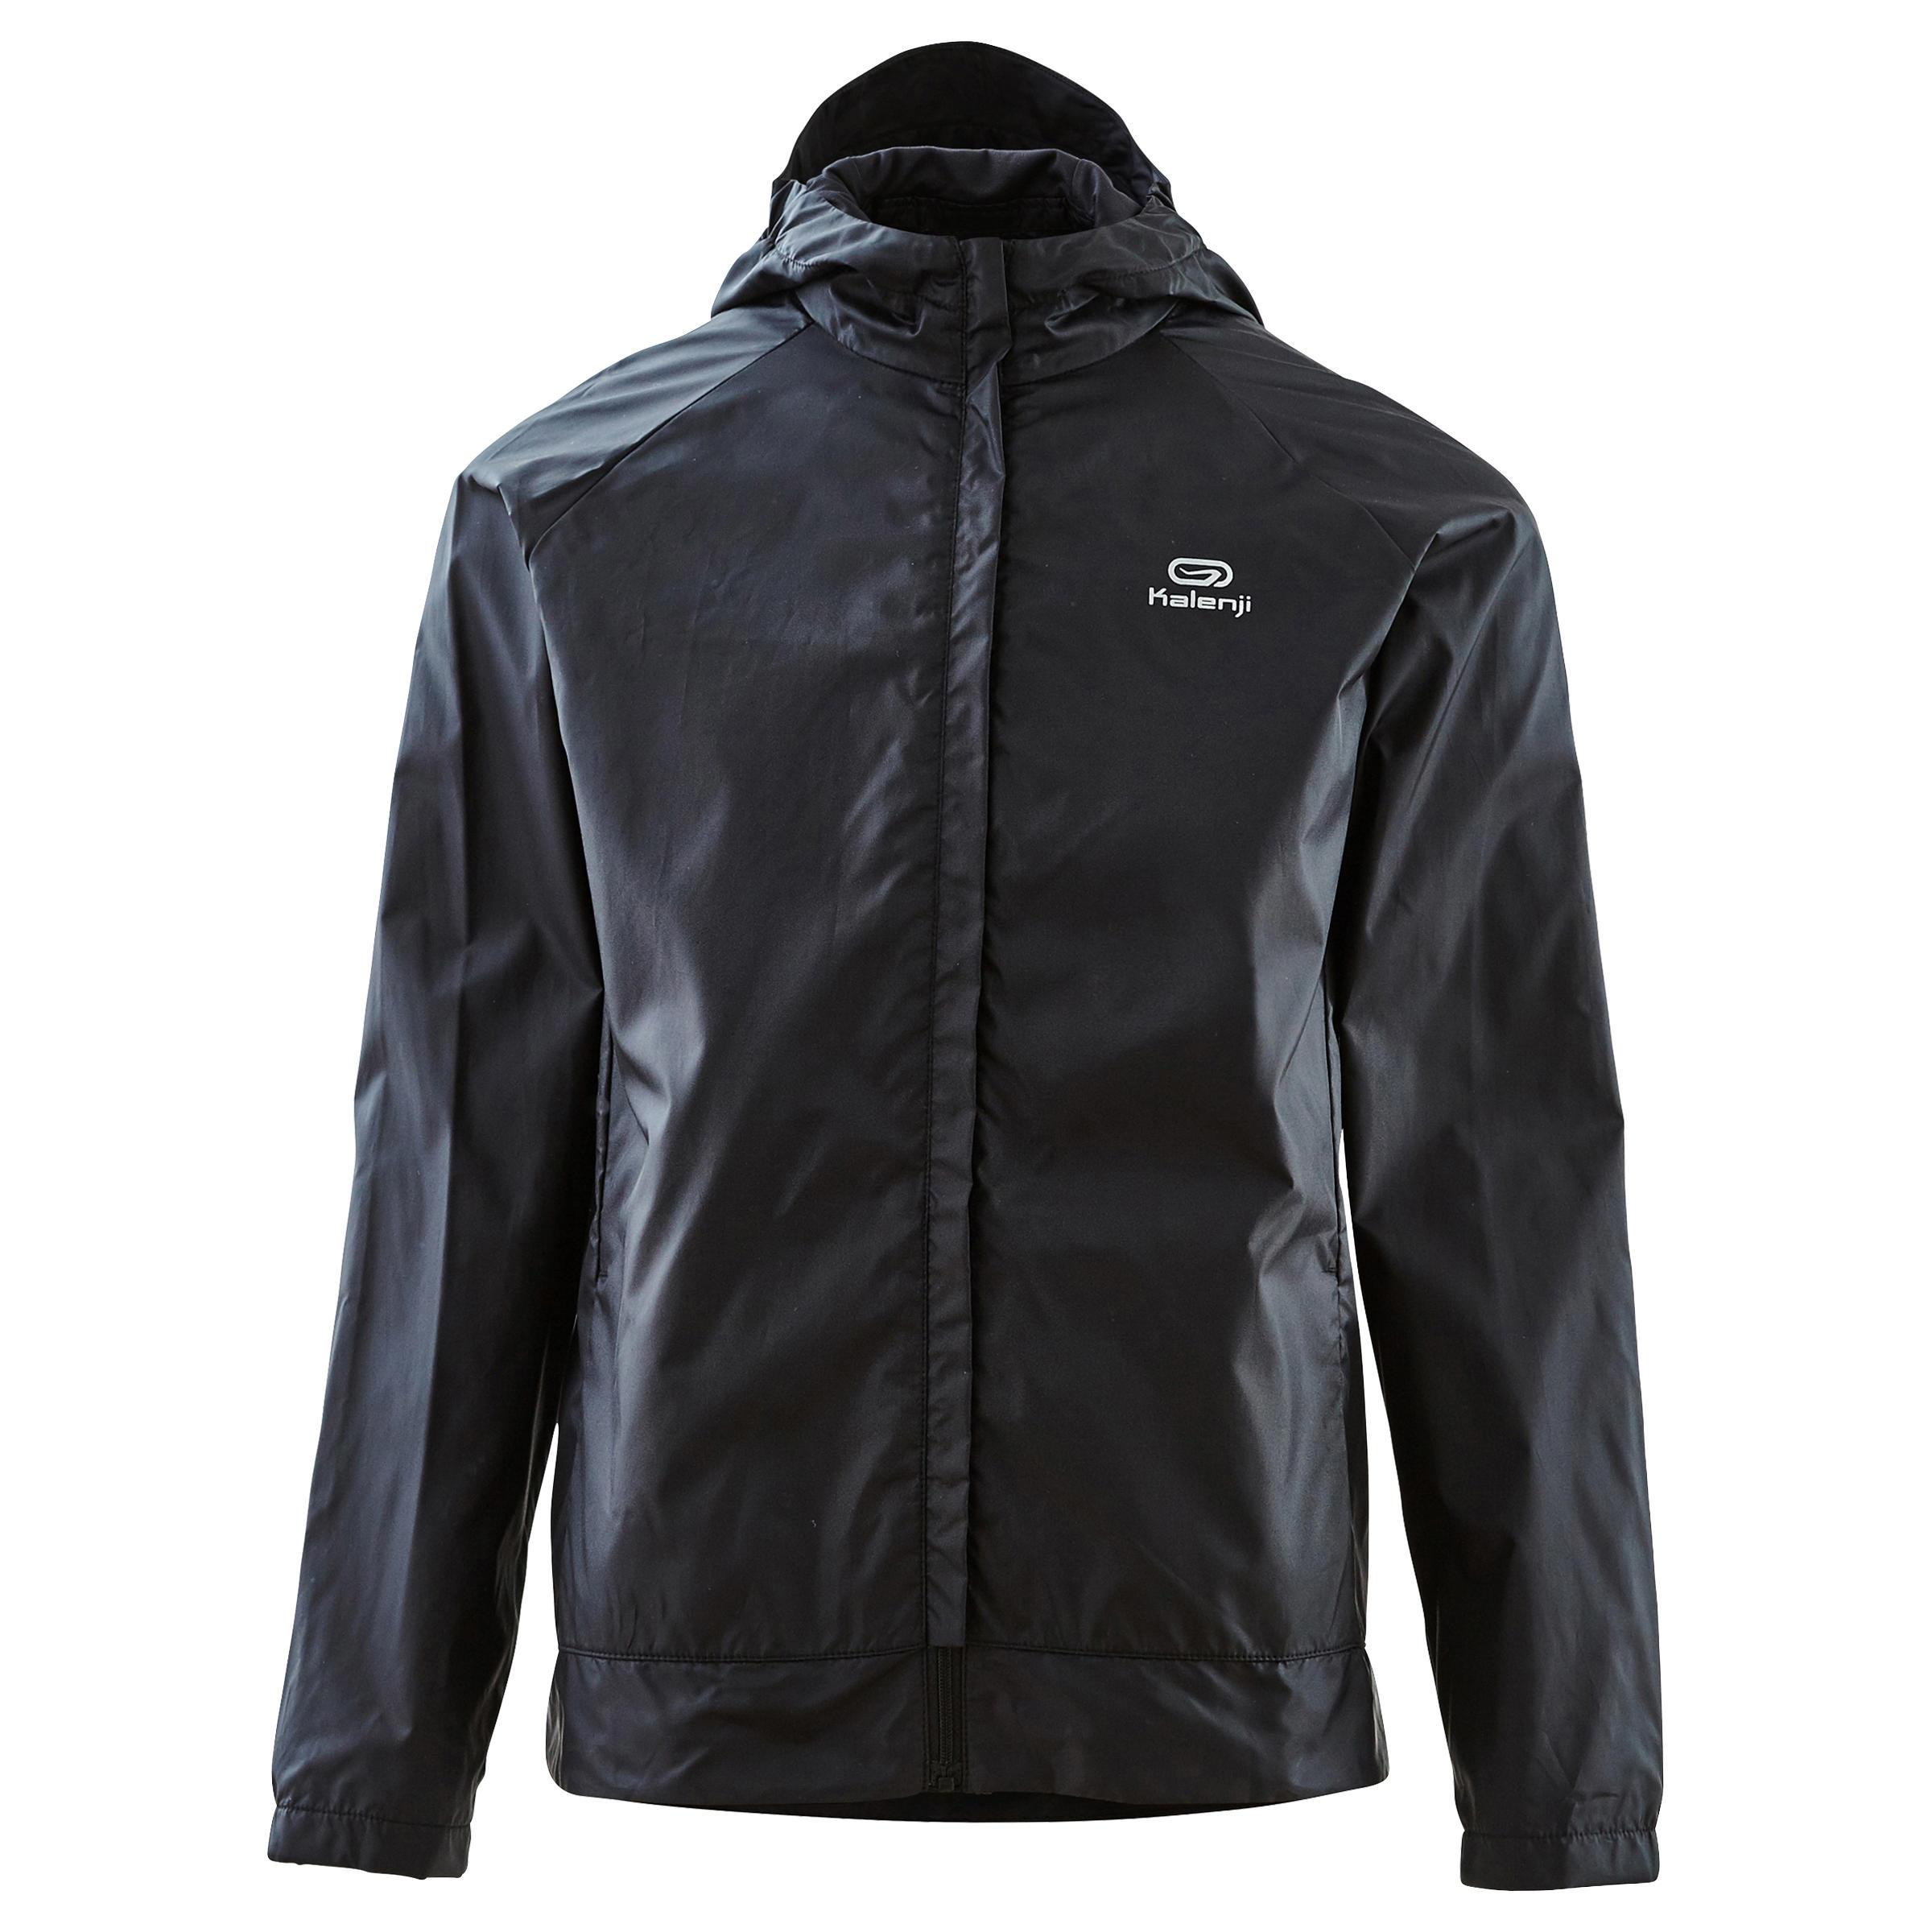 Jachetă protecție vânt Copii imagine